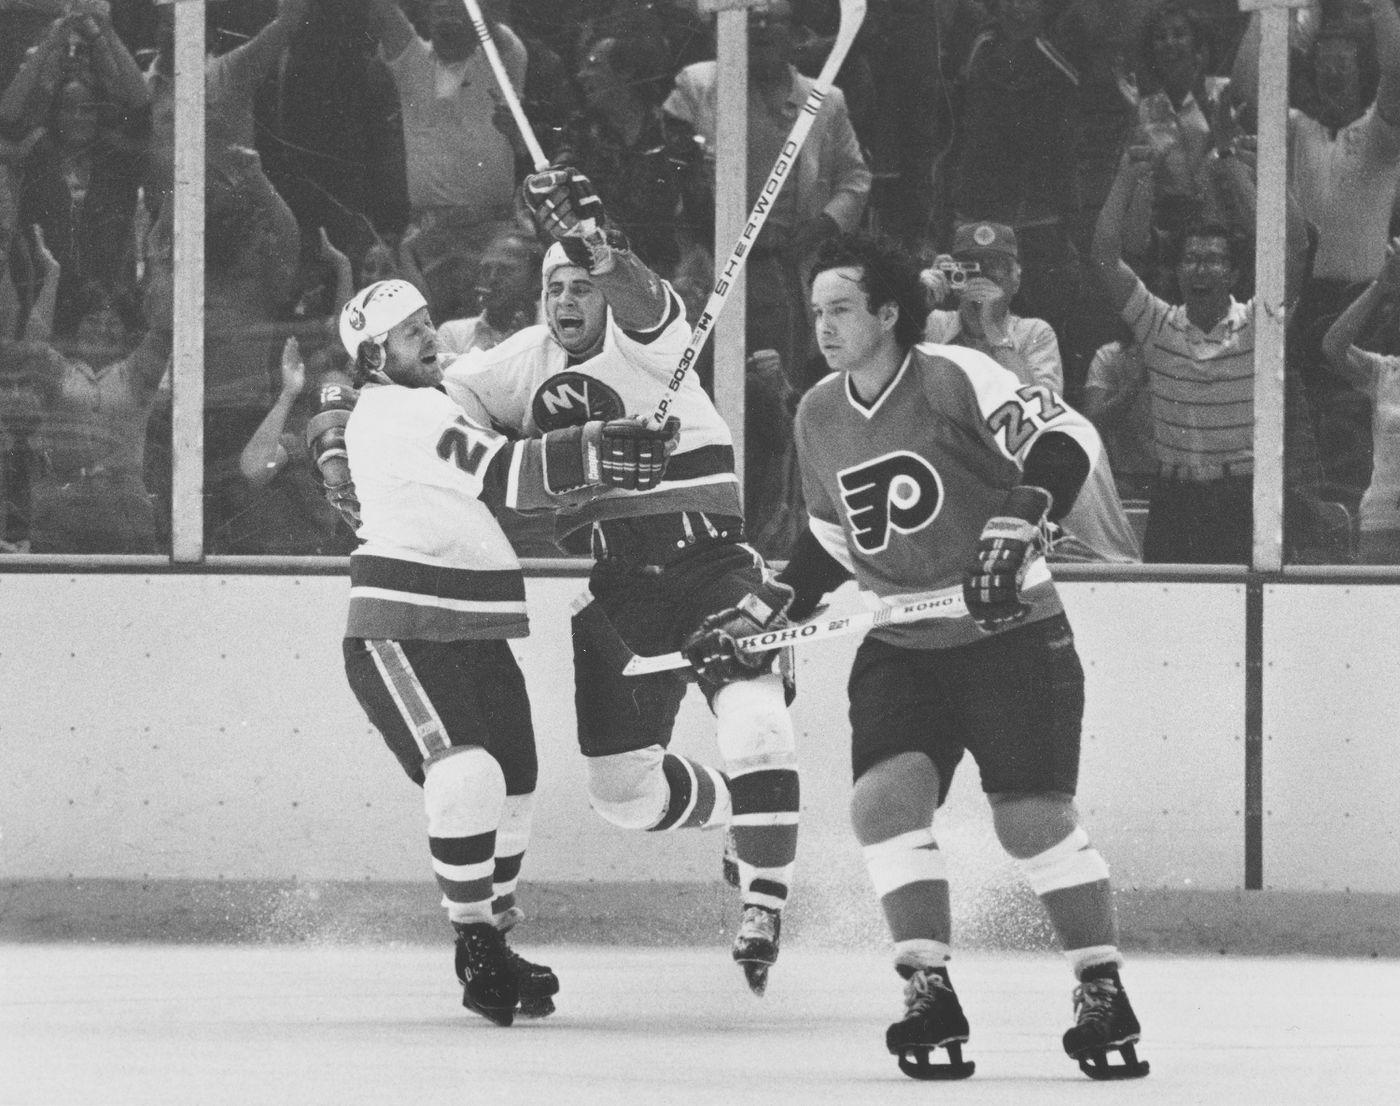 43ba4da47 Reggie Leach skates away as the Islanders  Butch Goring (left) and Duane  Sutter